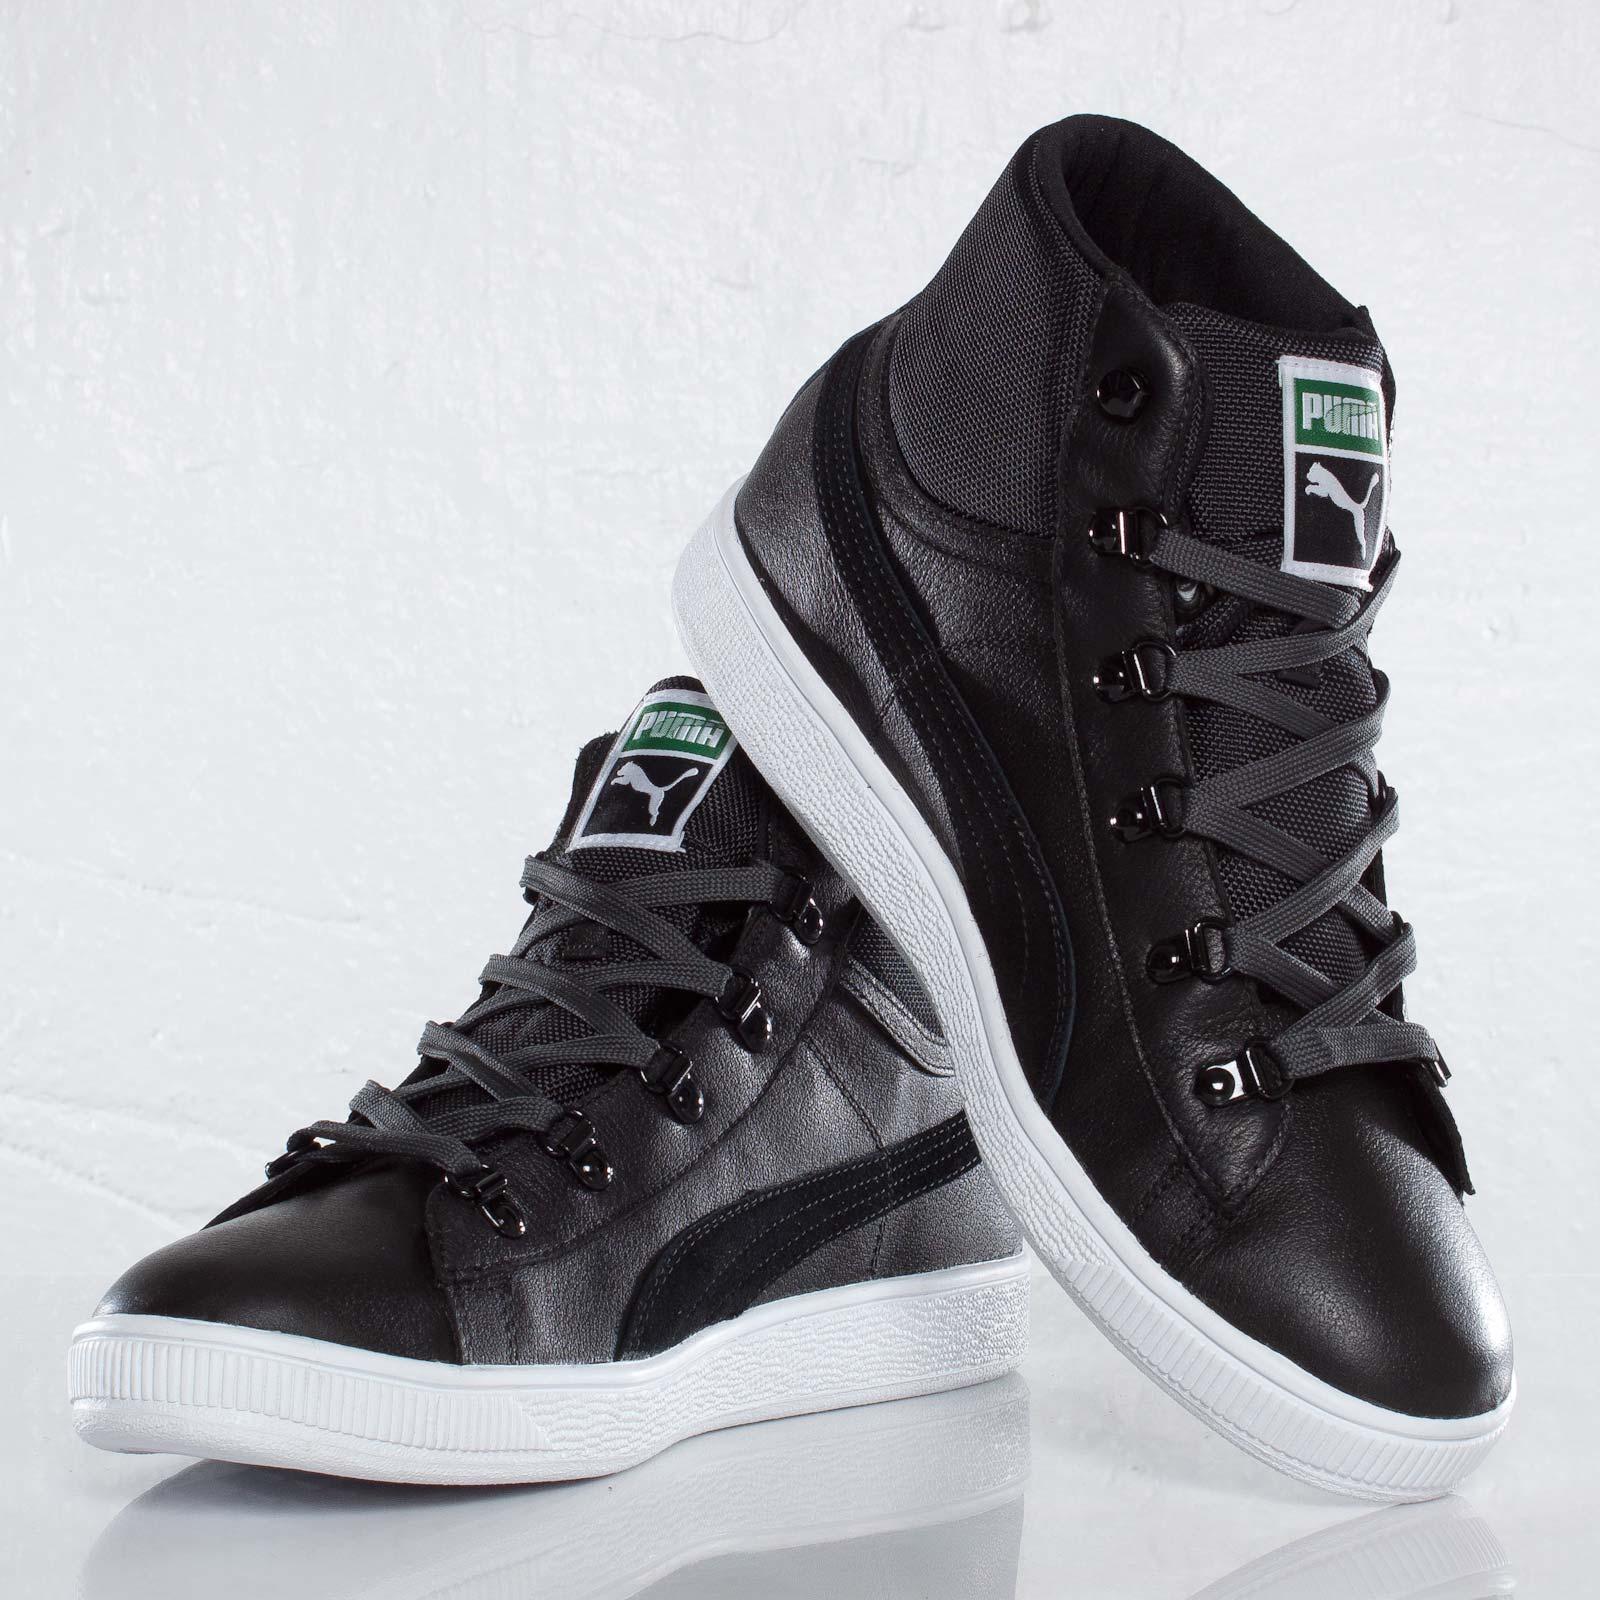 best sneakers 6c4fc 423b4 Puma Basket Classic Mid GTX - 354146-02 - Sneakersnstuff ...